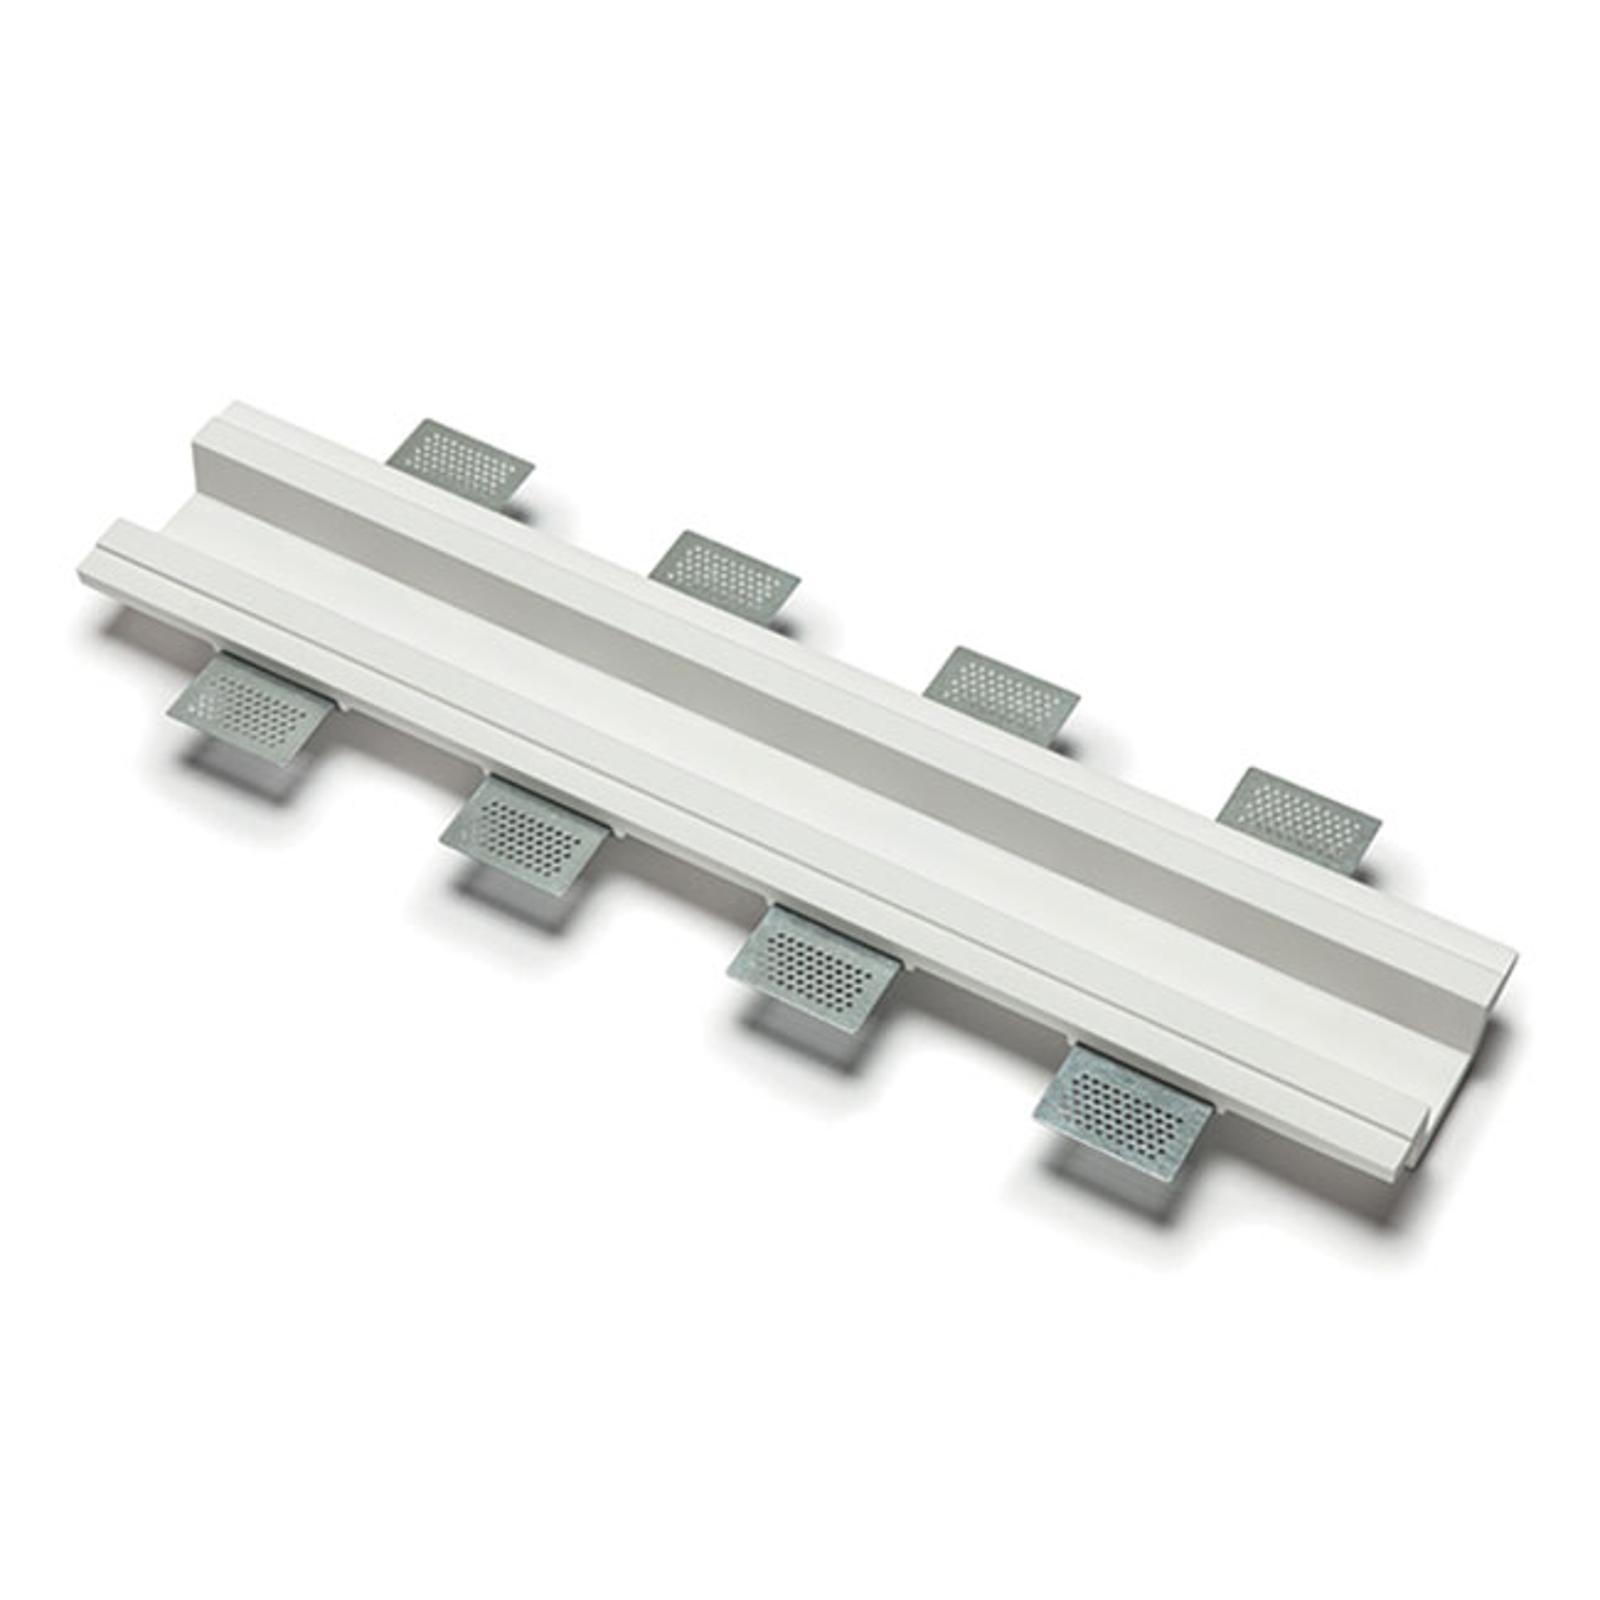 Forbindelsestykke f.or innbygget LED-taklampe 4191